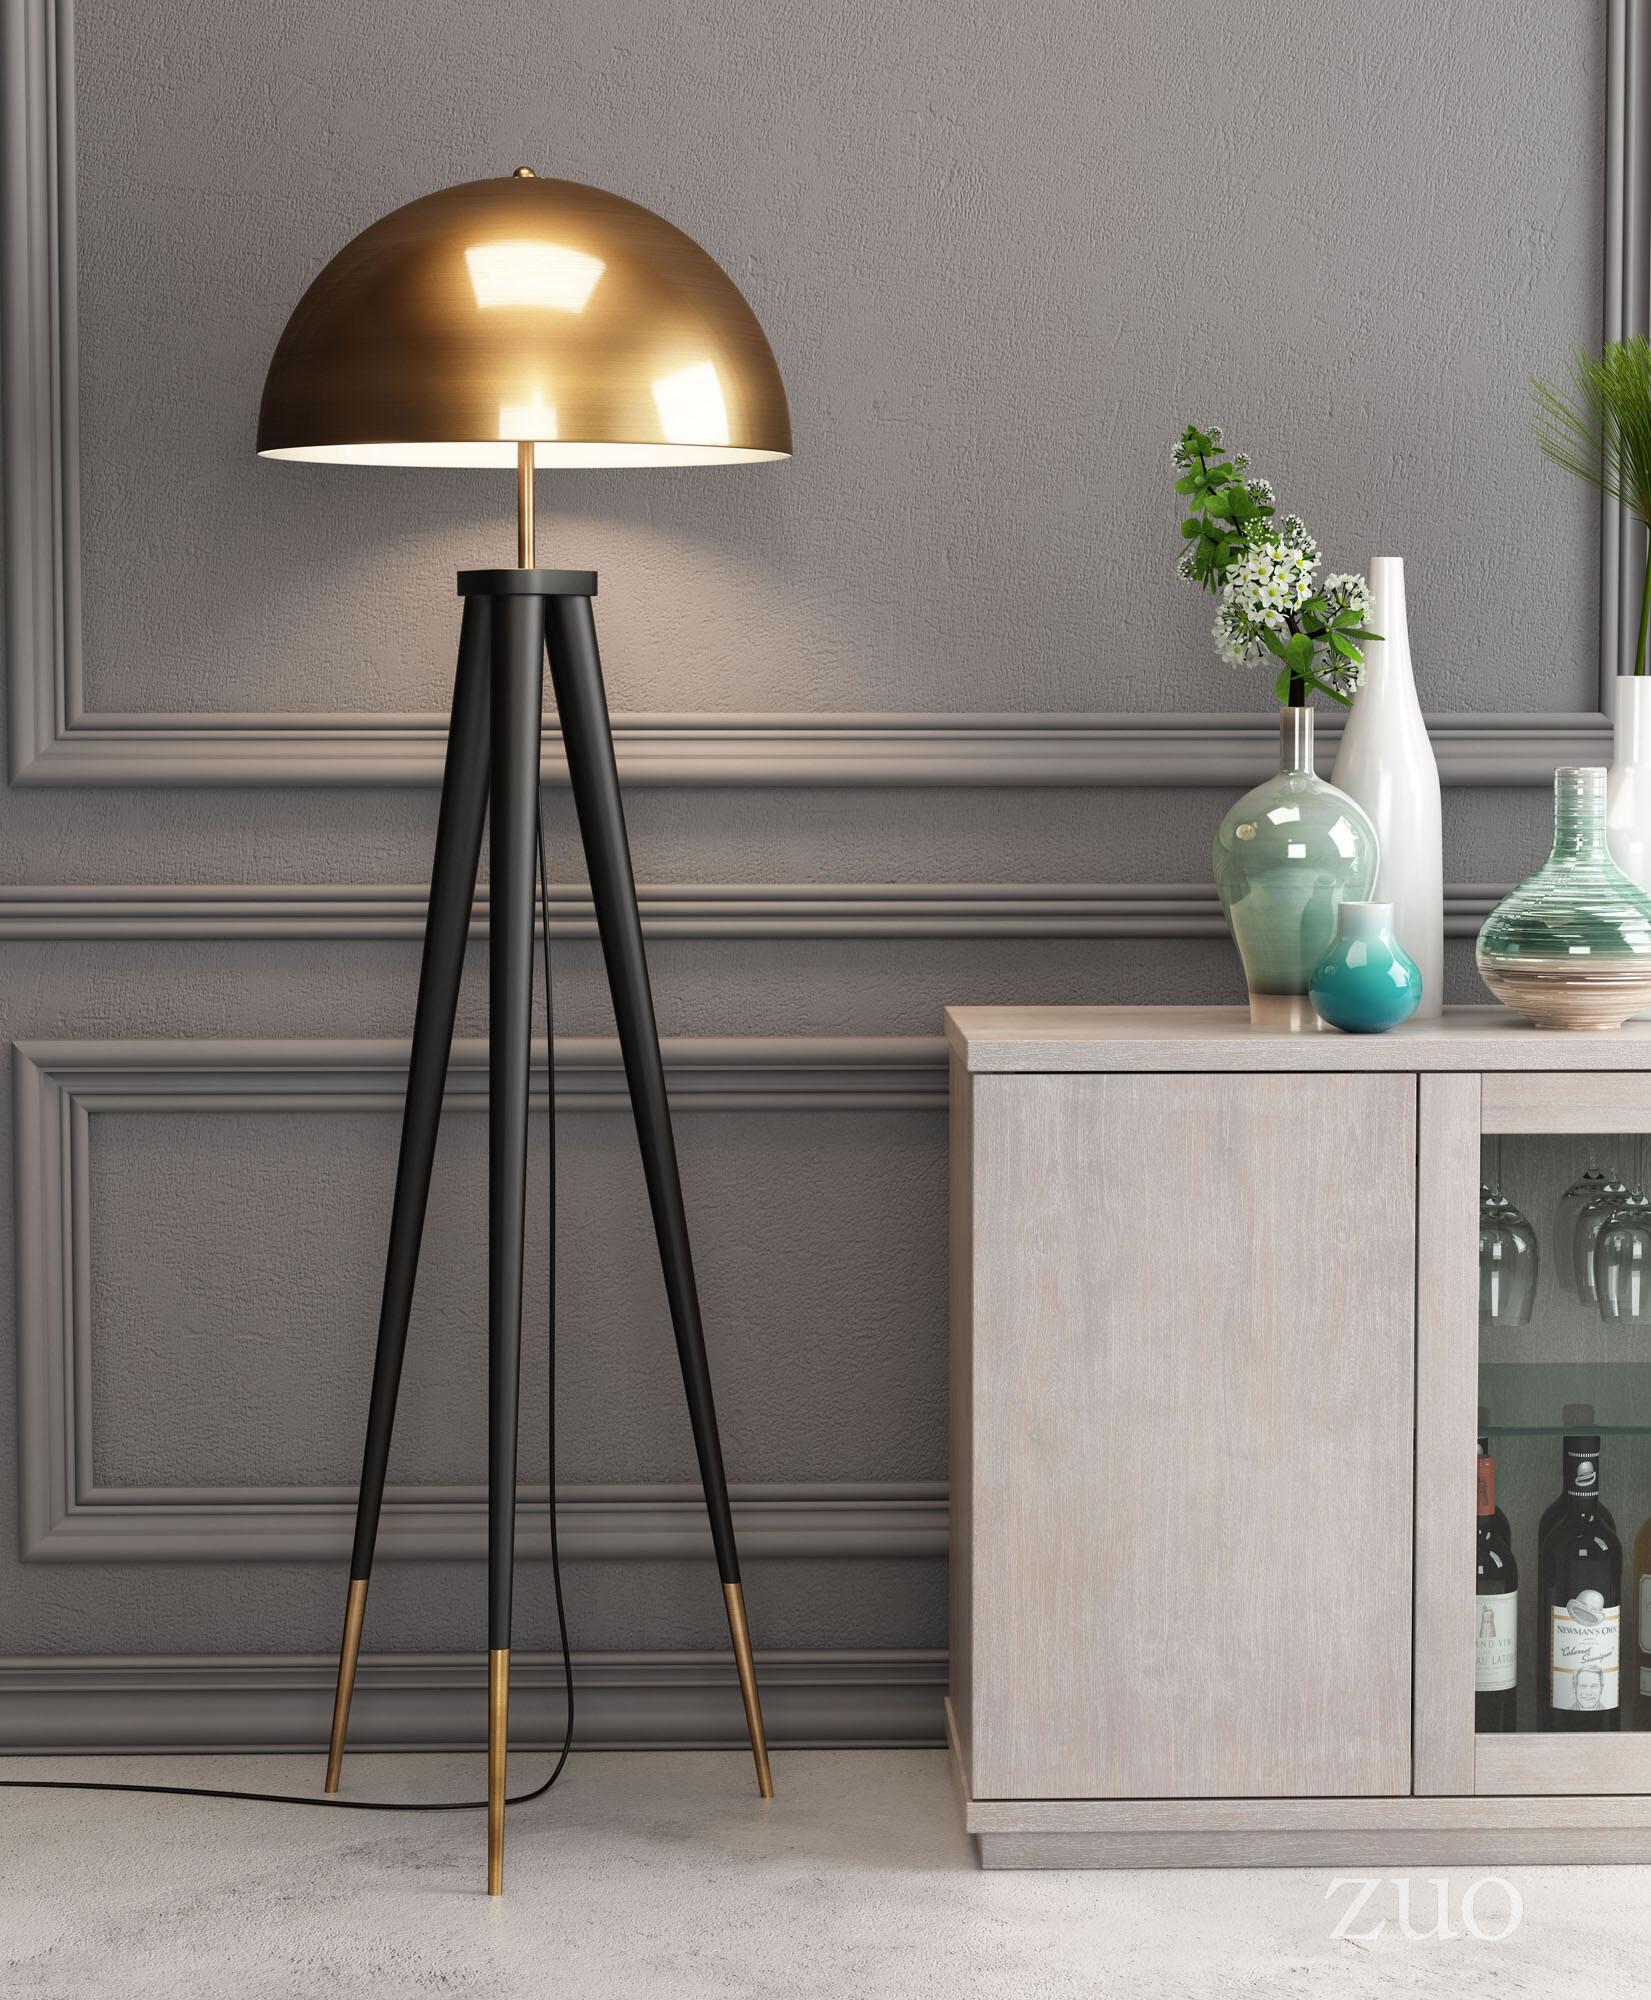 56088 Mascot Floor Lamp Brass & Black